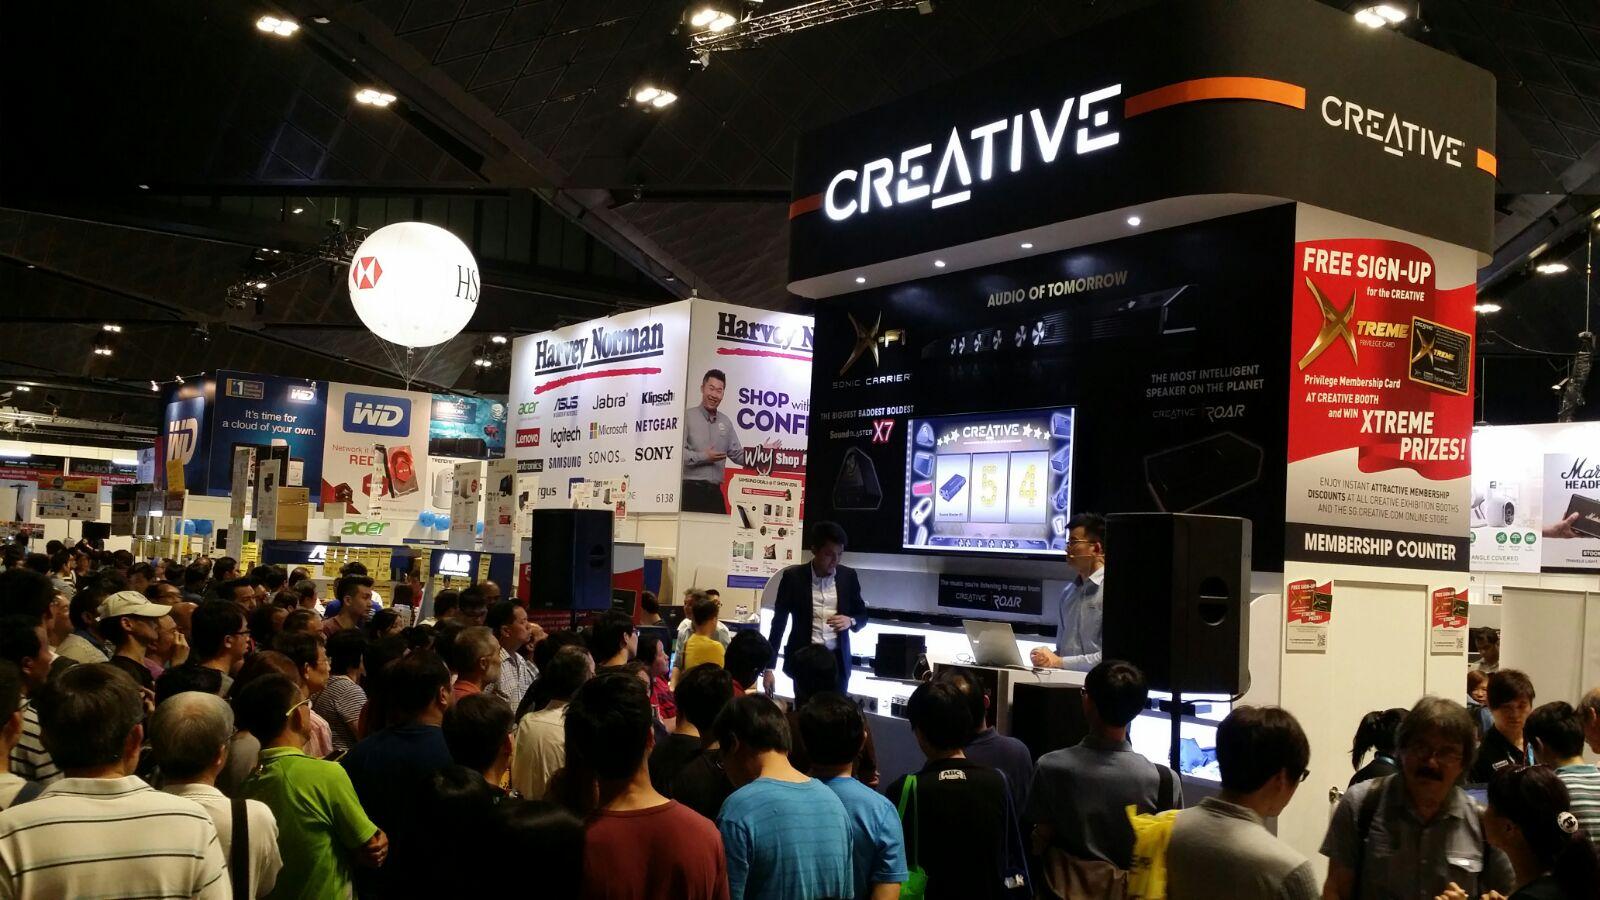 CREATIVE - I T  Show 2016 @ Suntec Singapore (10-13 March